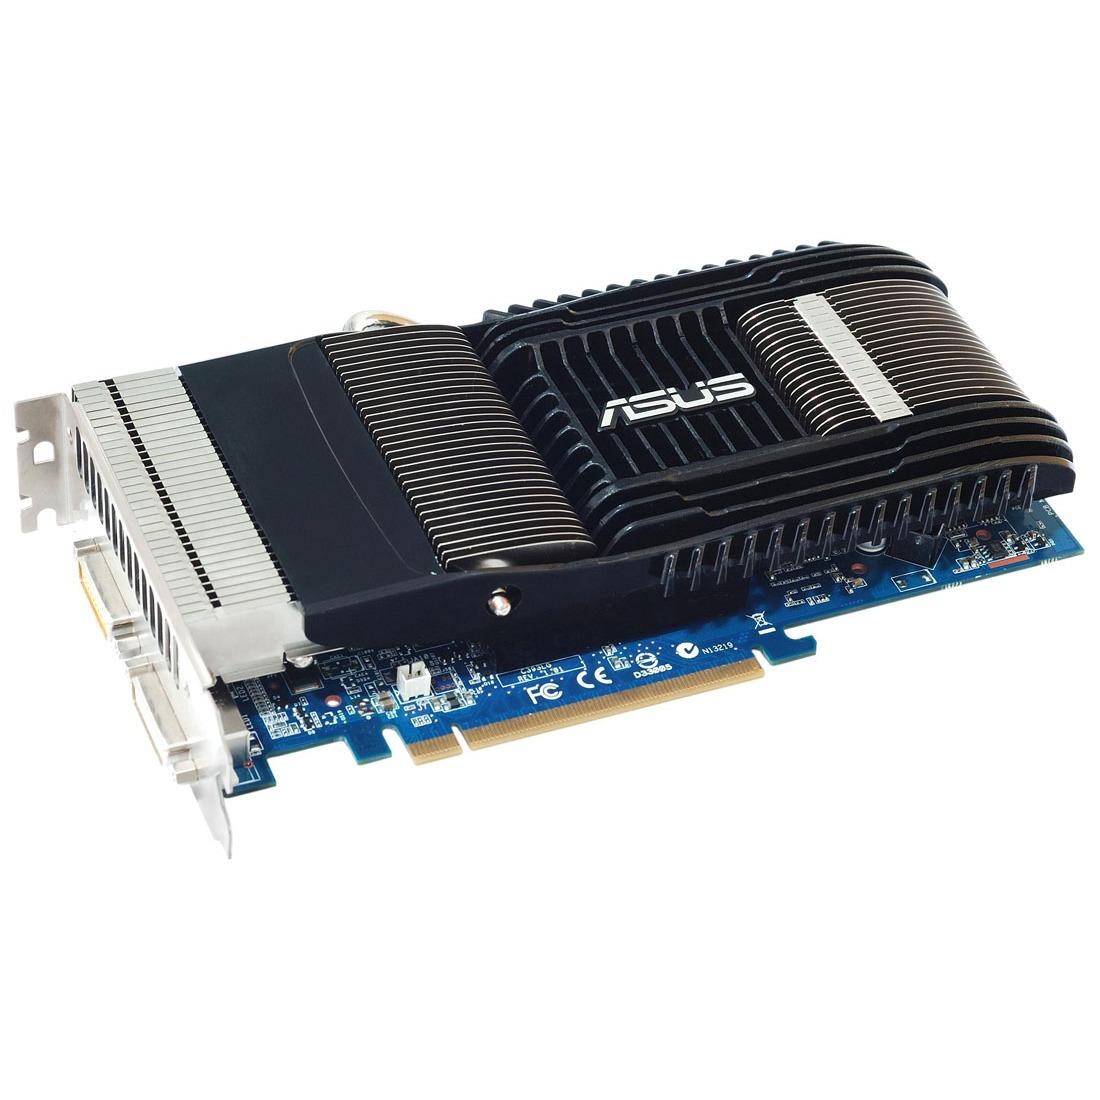 Carte graphique ASUS EN9600GT SILENT/2D/512MD3 ASUS EN9600GT SILENT/2D/512MD3 - 512 Mo Dual DVI - PCI Express (NVIDIA GeForce avec CUDA 9600 GT) - (garantie 3 ans)